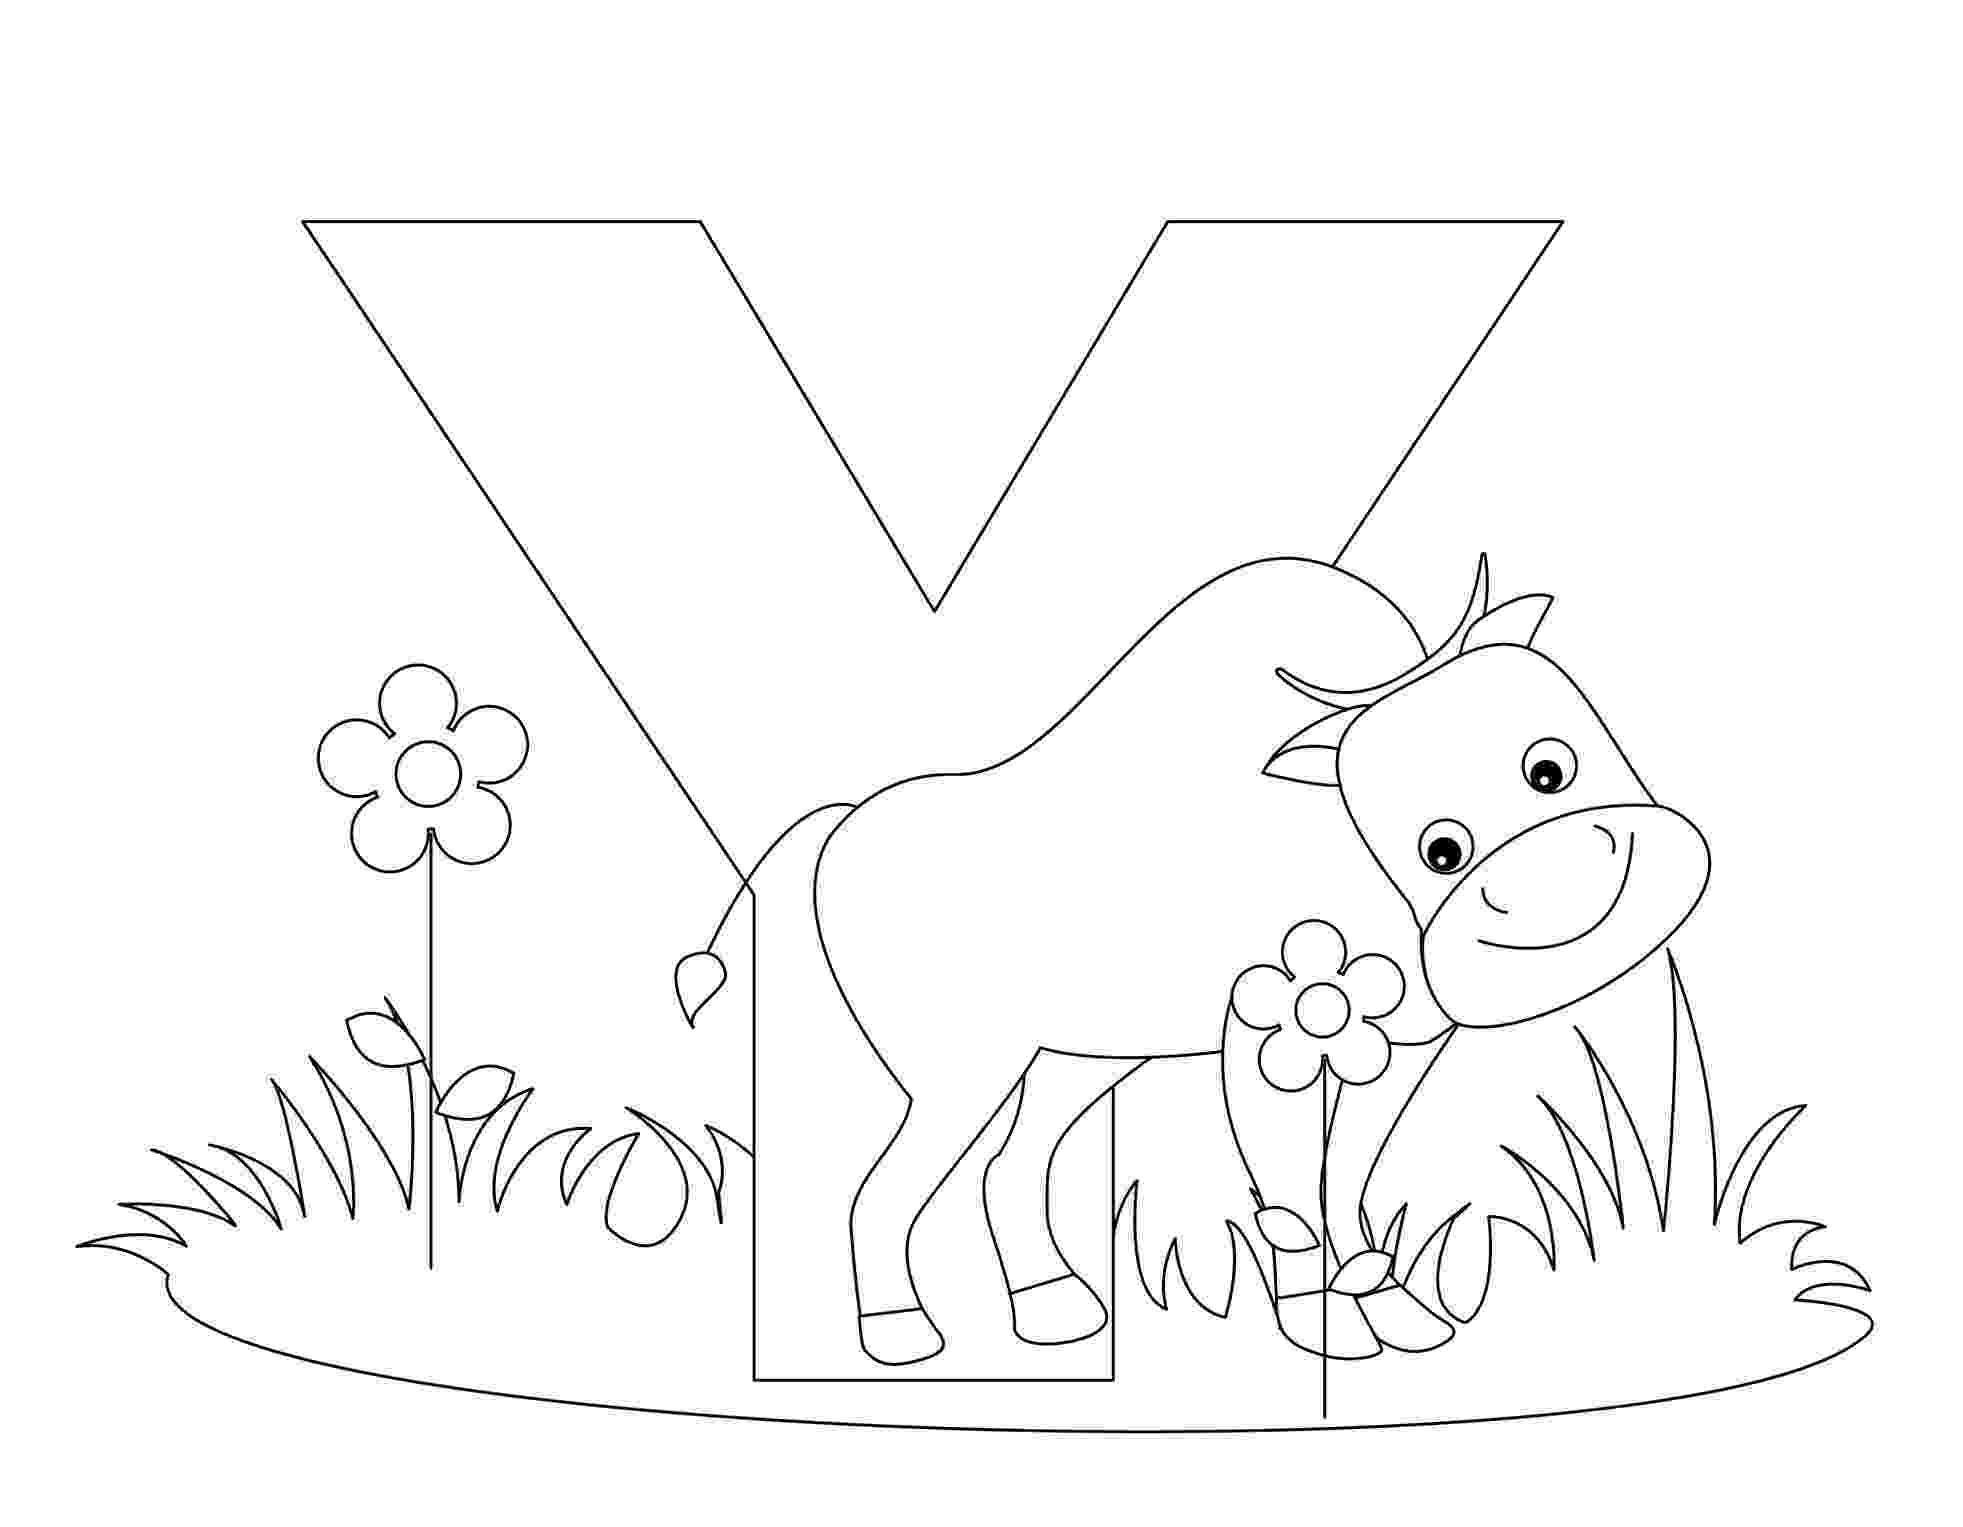 coloring animal alphabet free printable alphabet coloring pages for kids best animal alphabet coloring 1 2